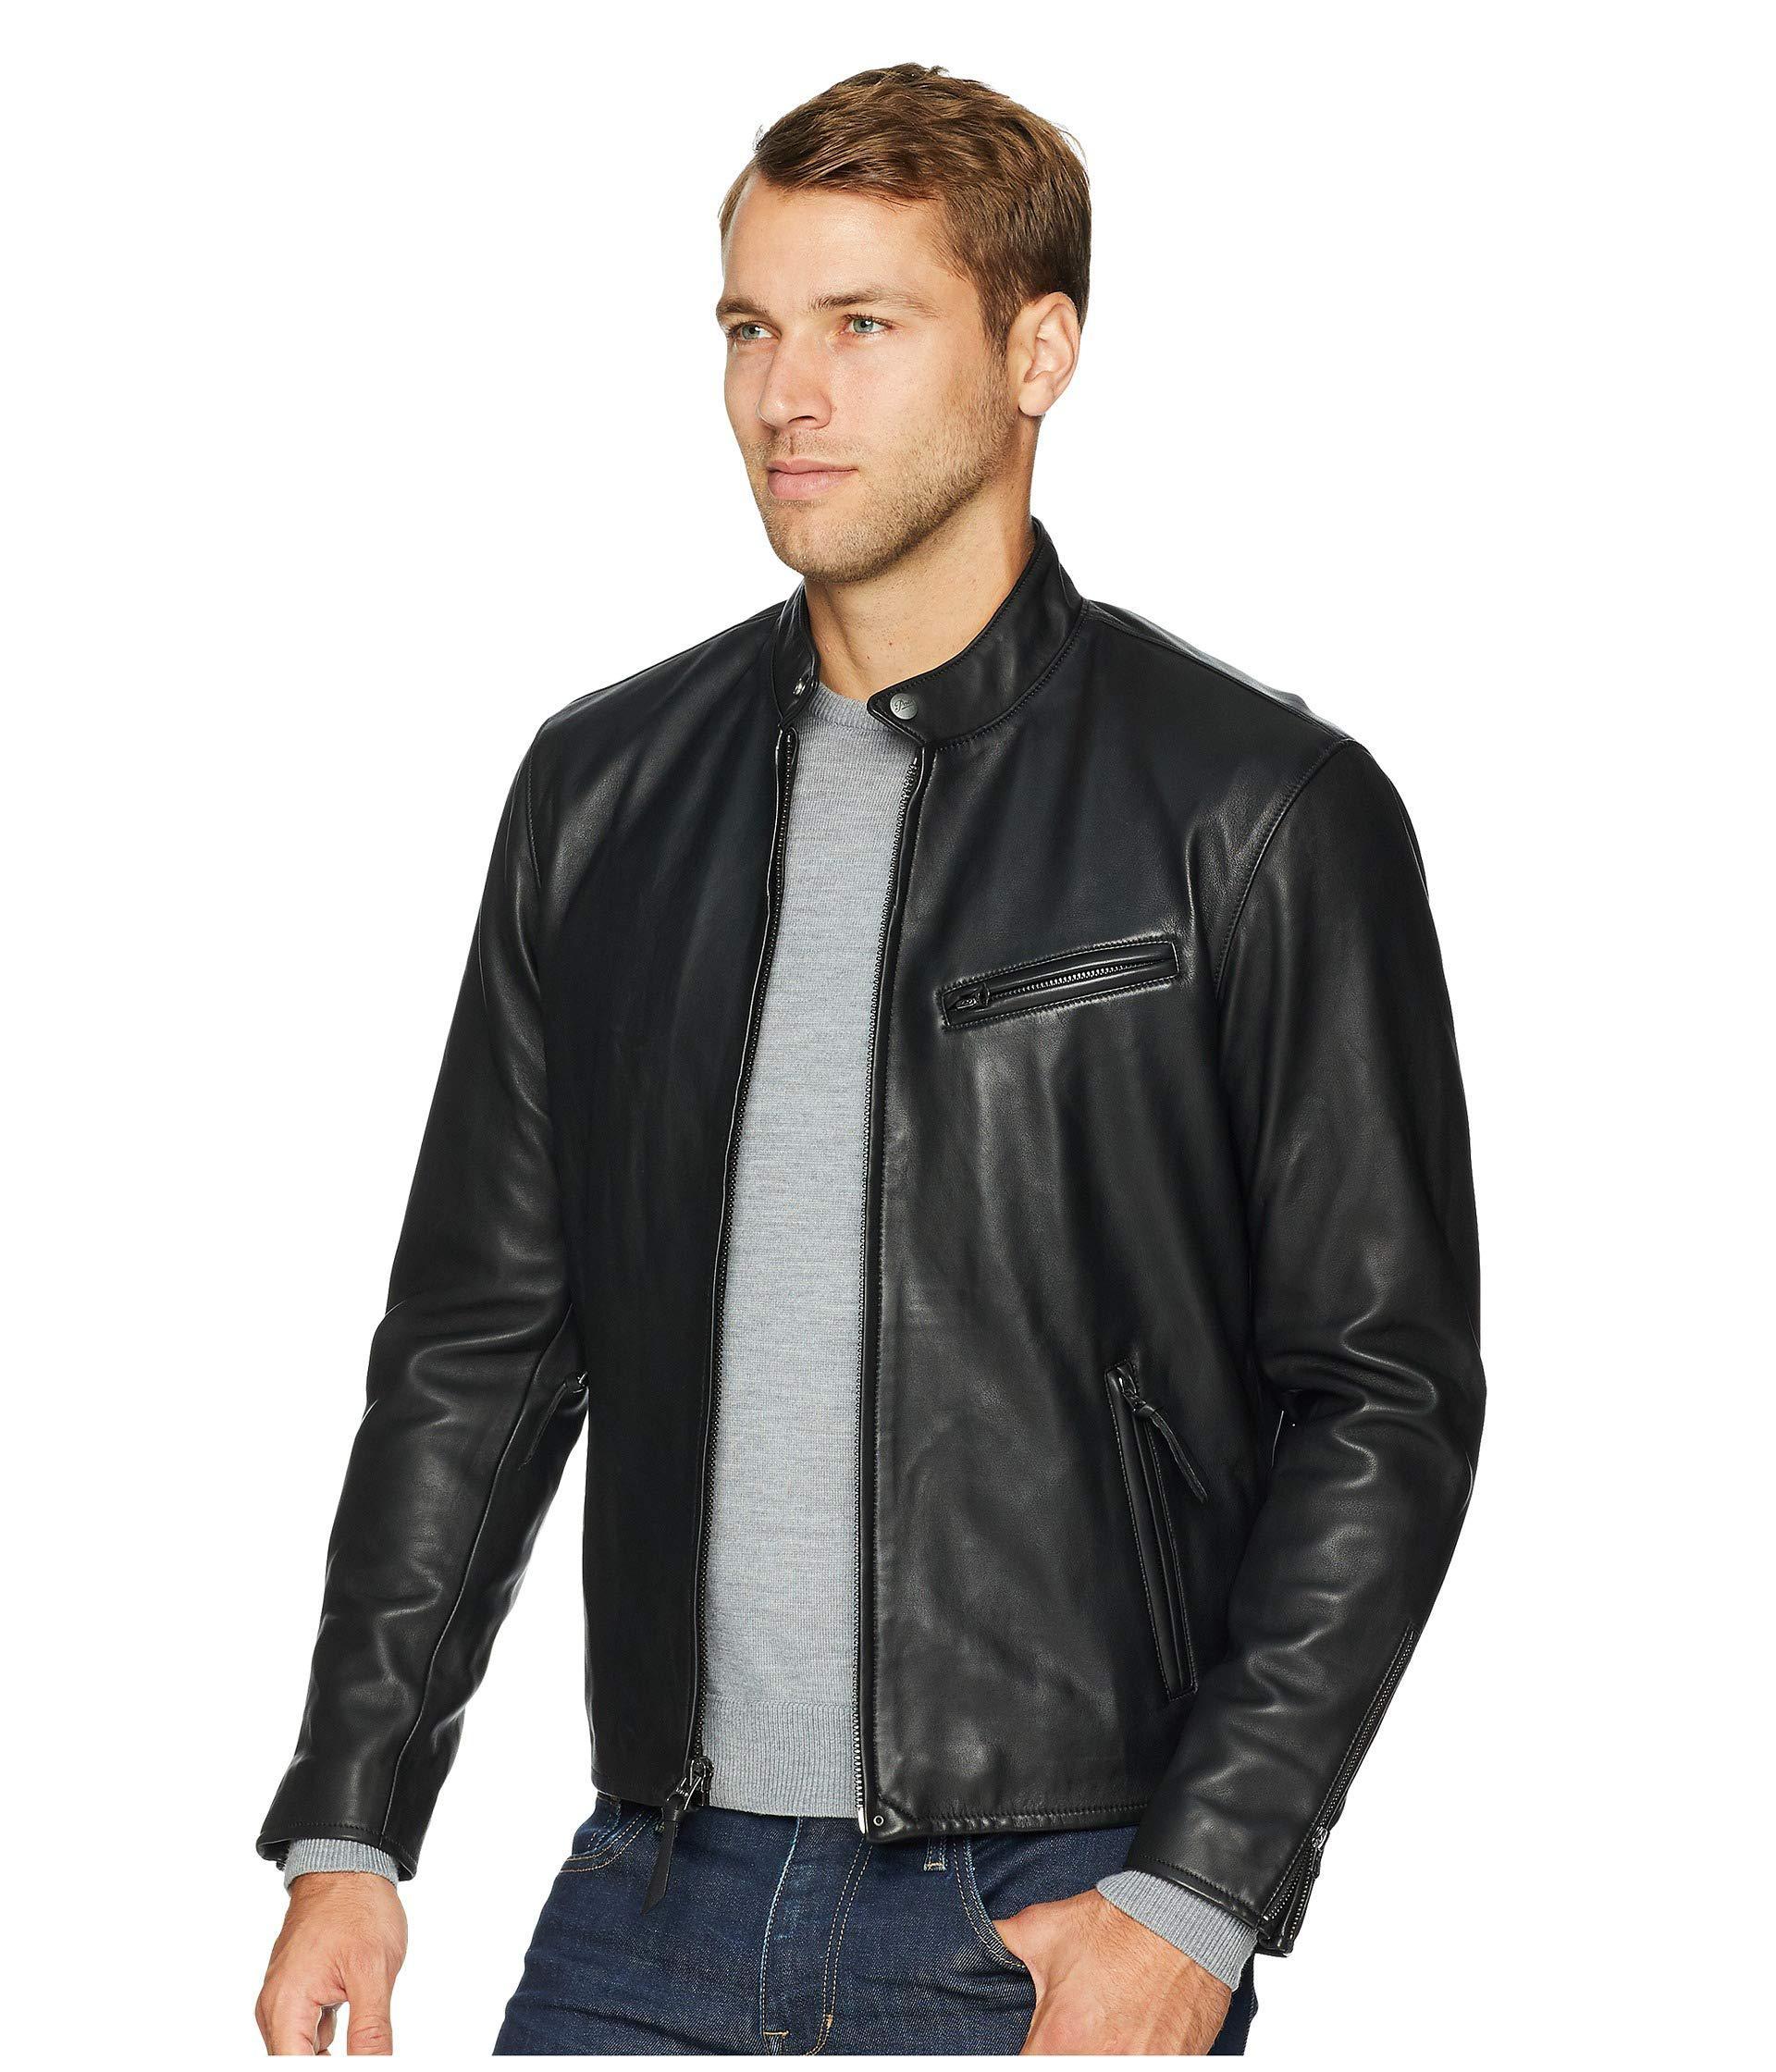 d2b2077642d9 Lyst - Polo Ralph Lauren Cafe Racer Leather Jacket (old Amber) Men s Coat  in Black for Men